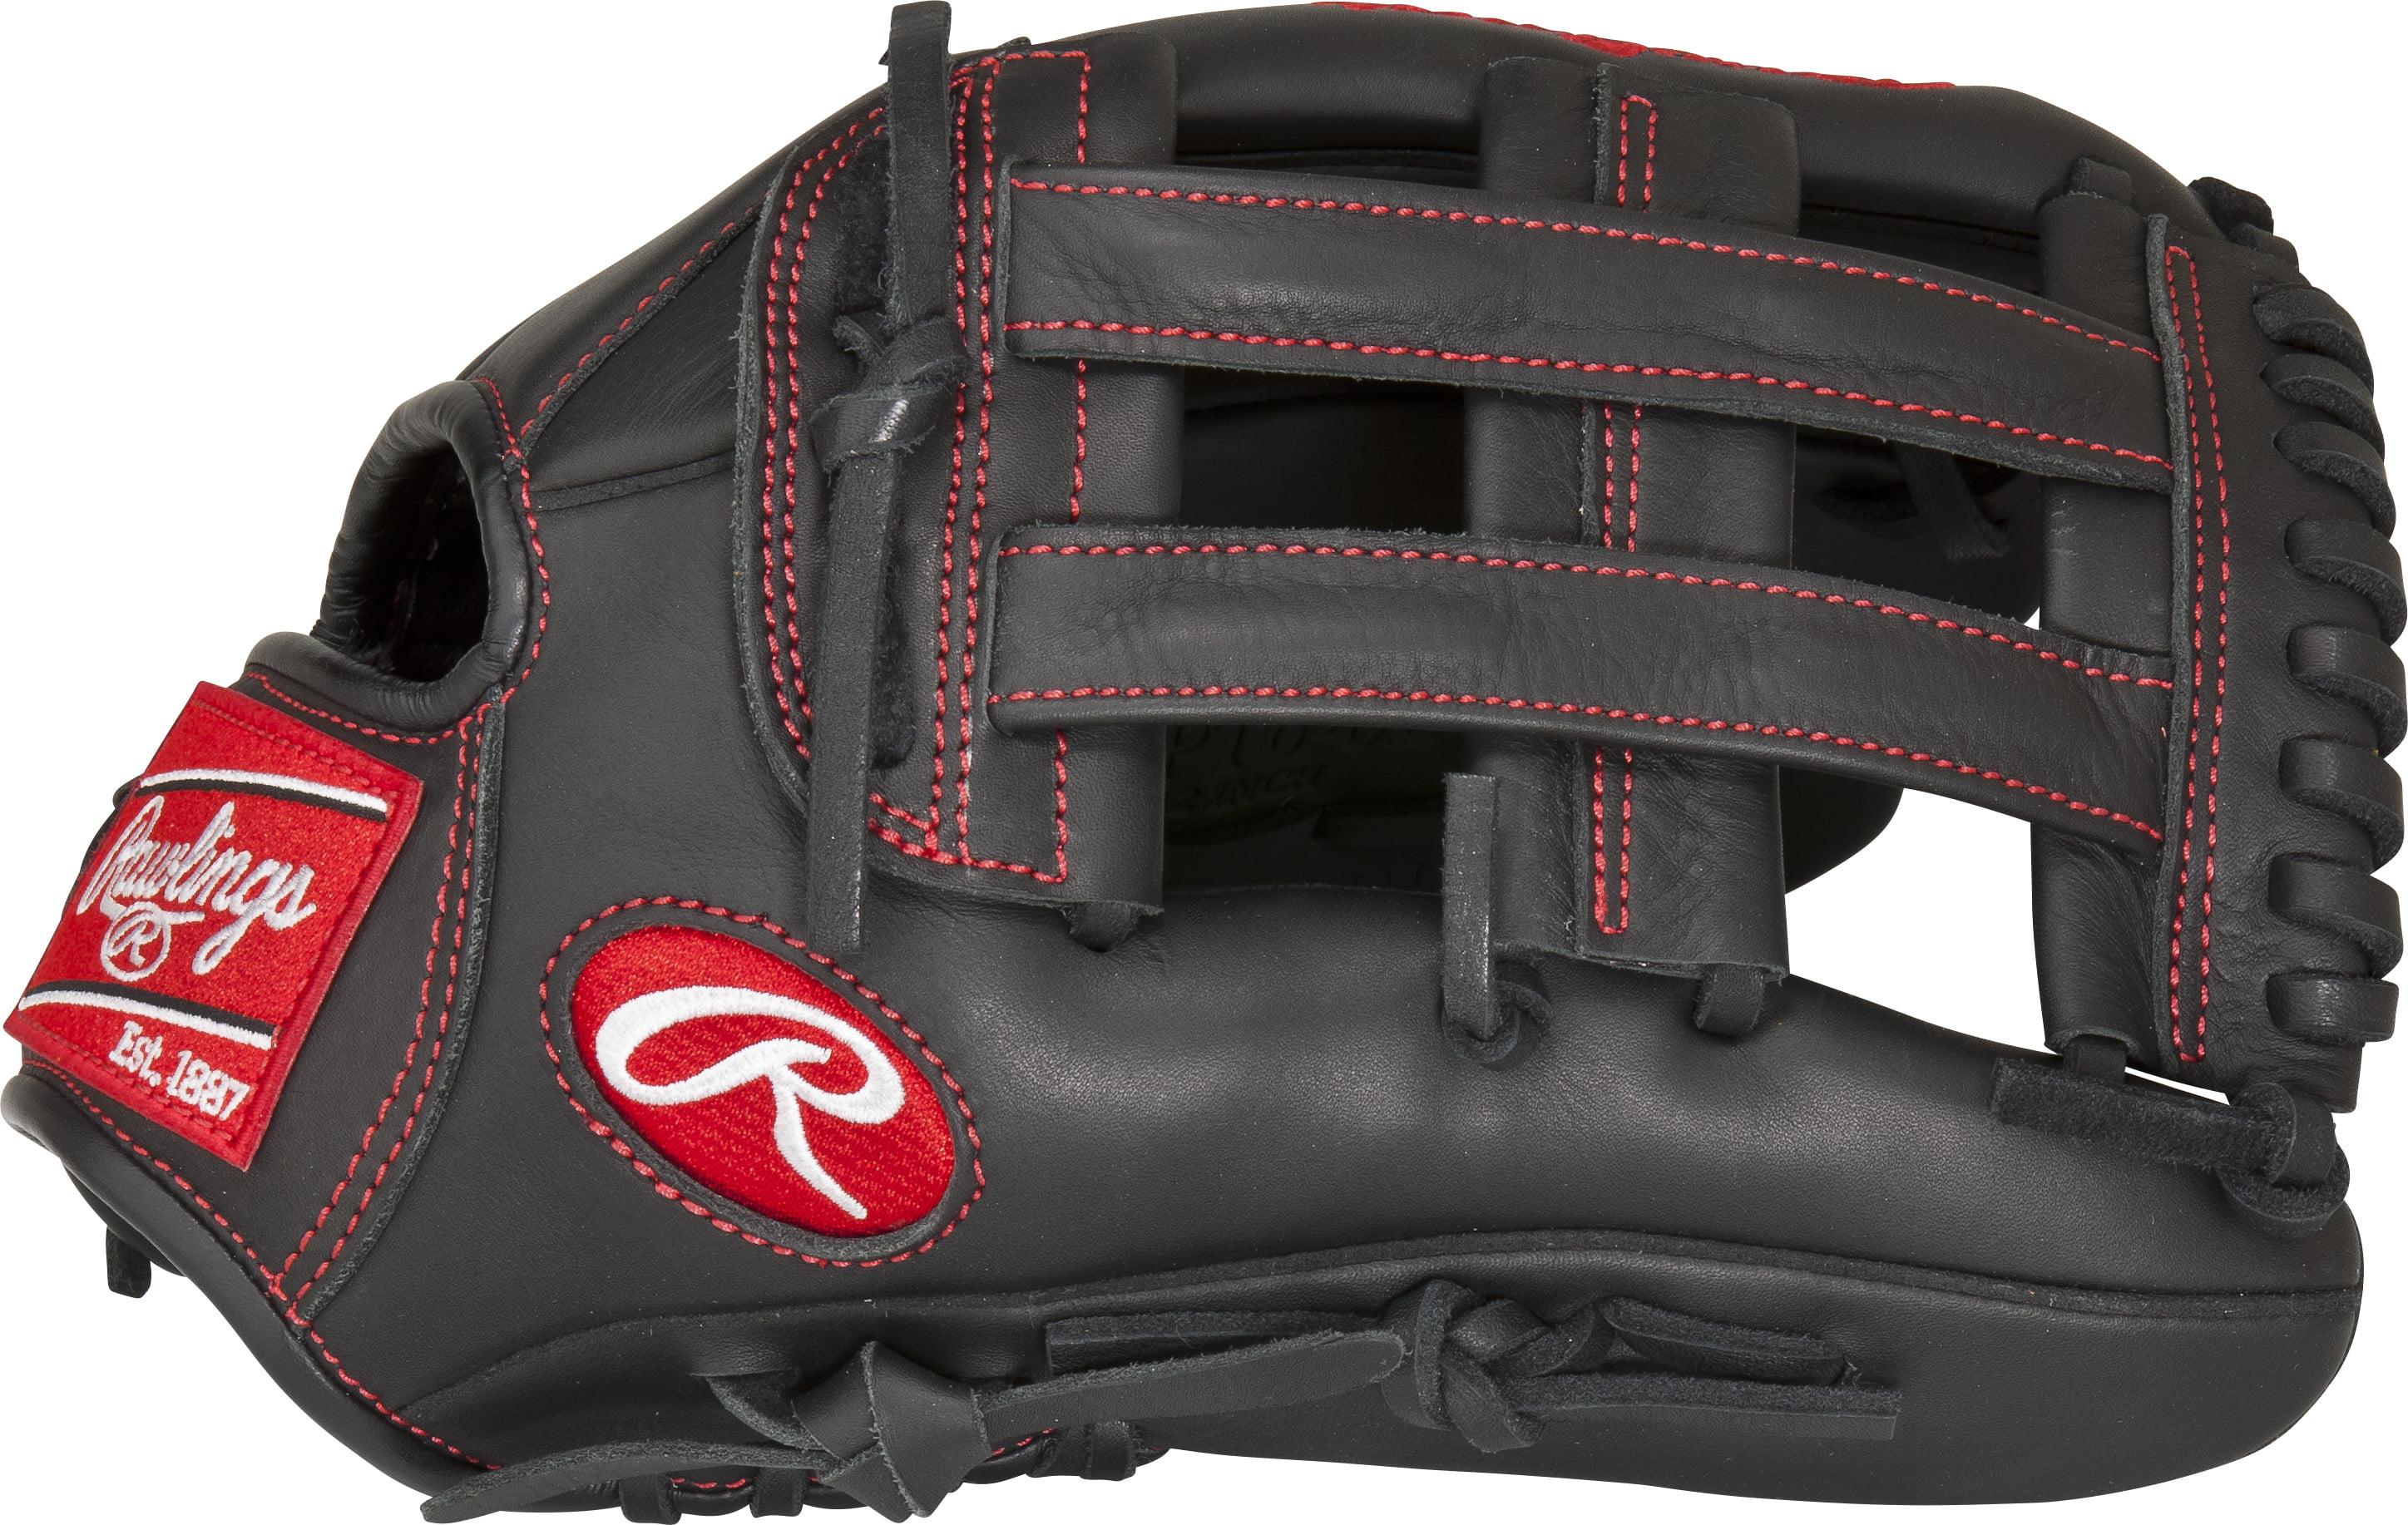 Rawlings Gamer Youth Pro Taper Series Baseball Glove by Rawlings